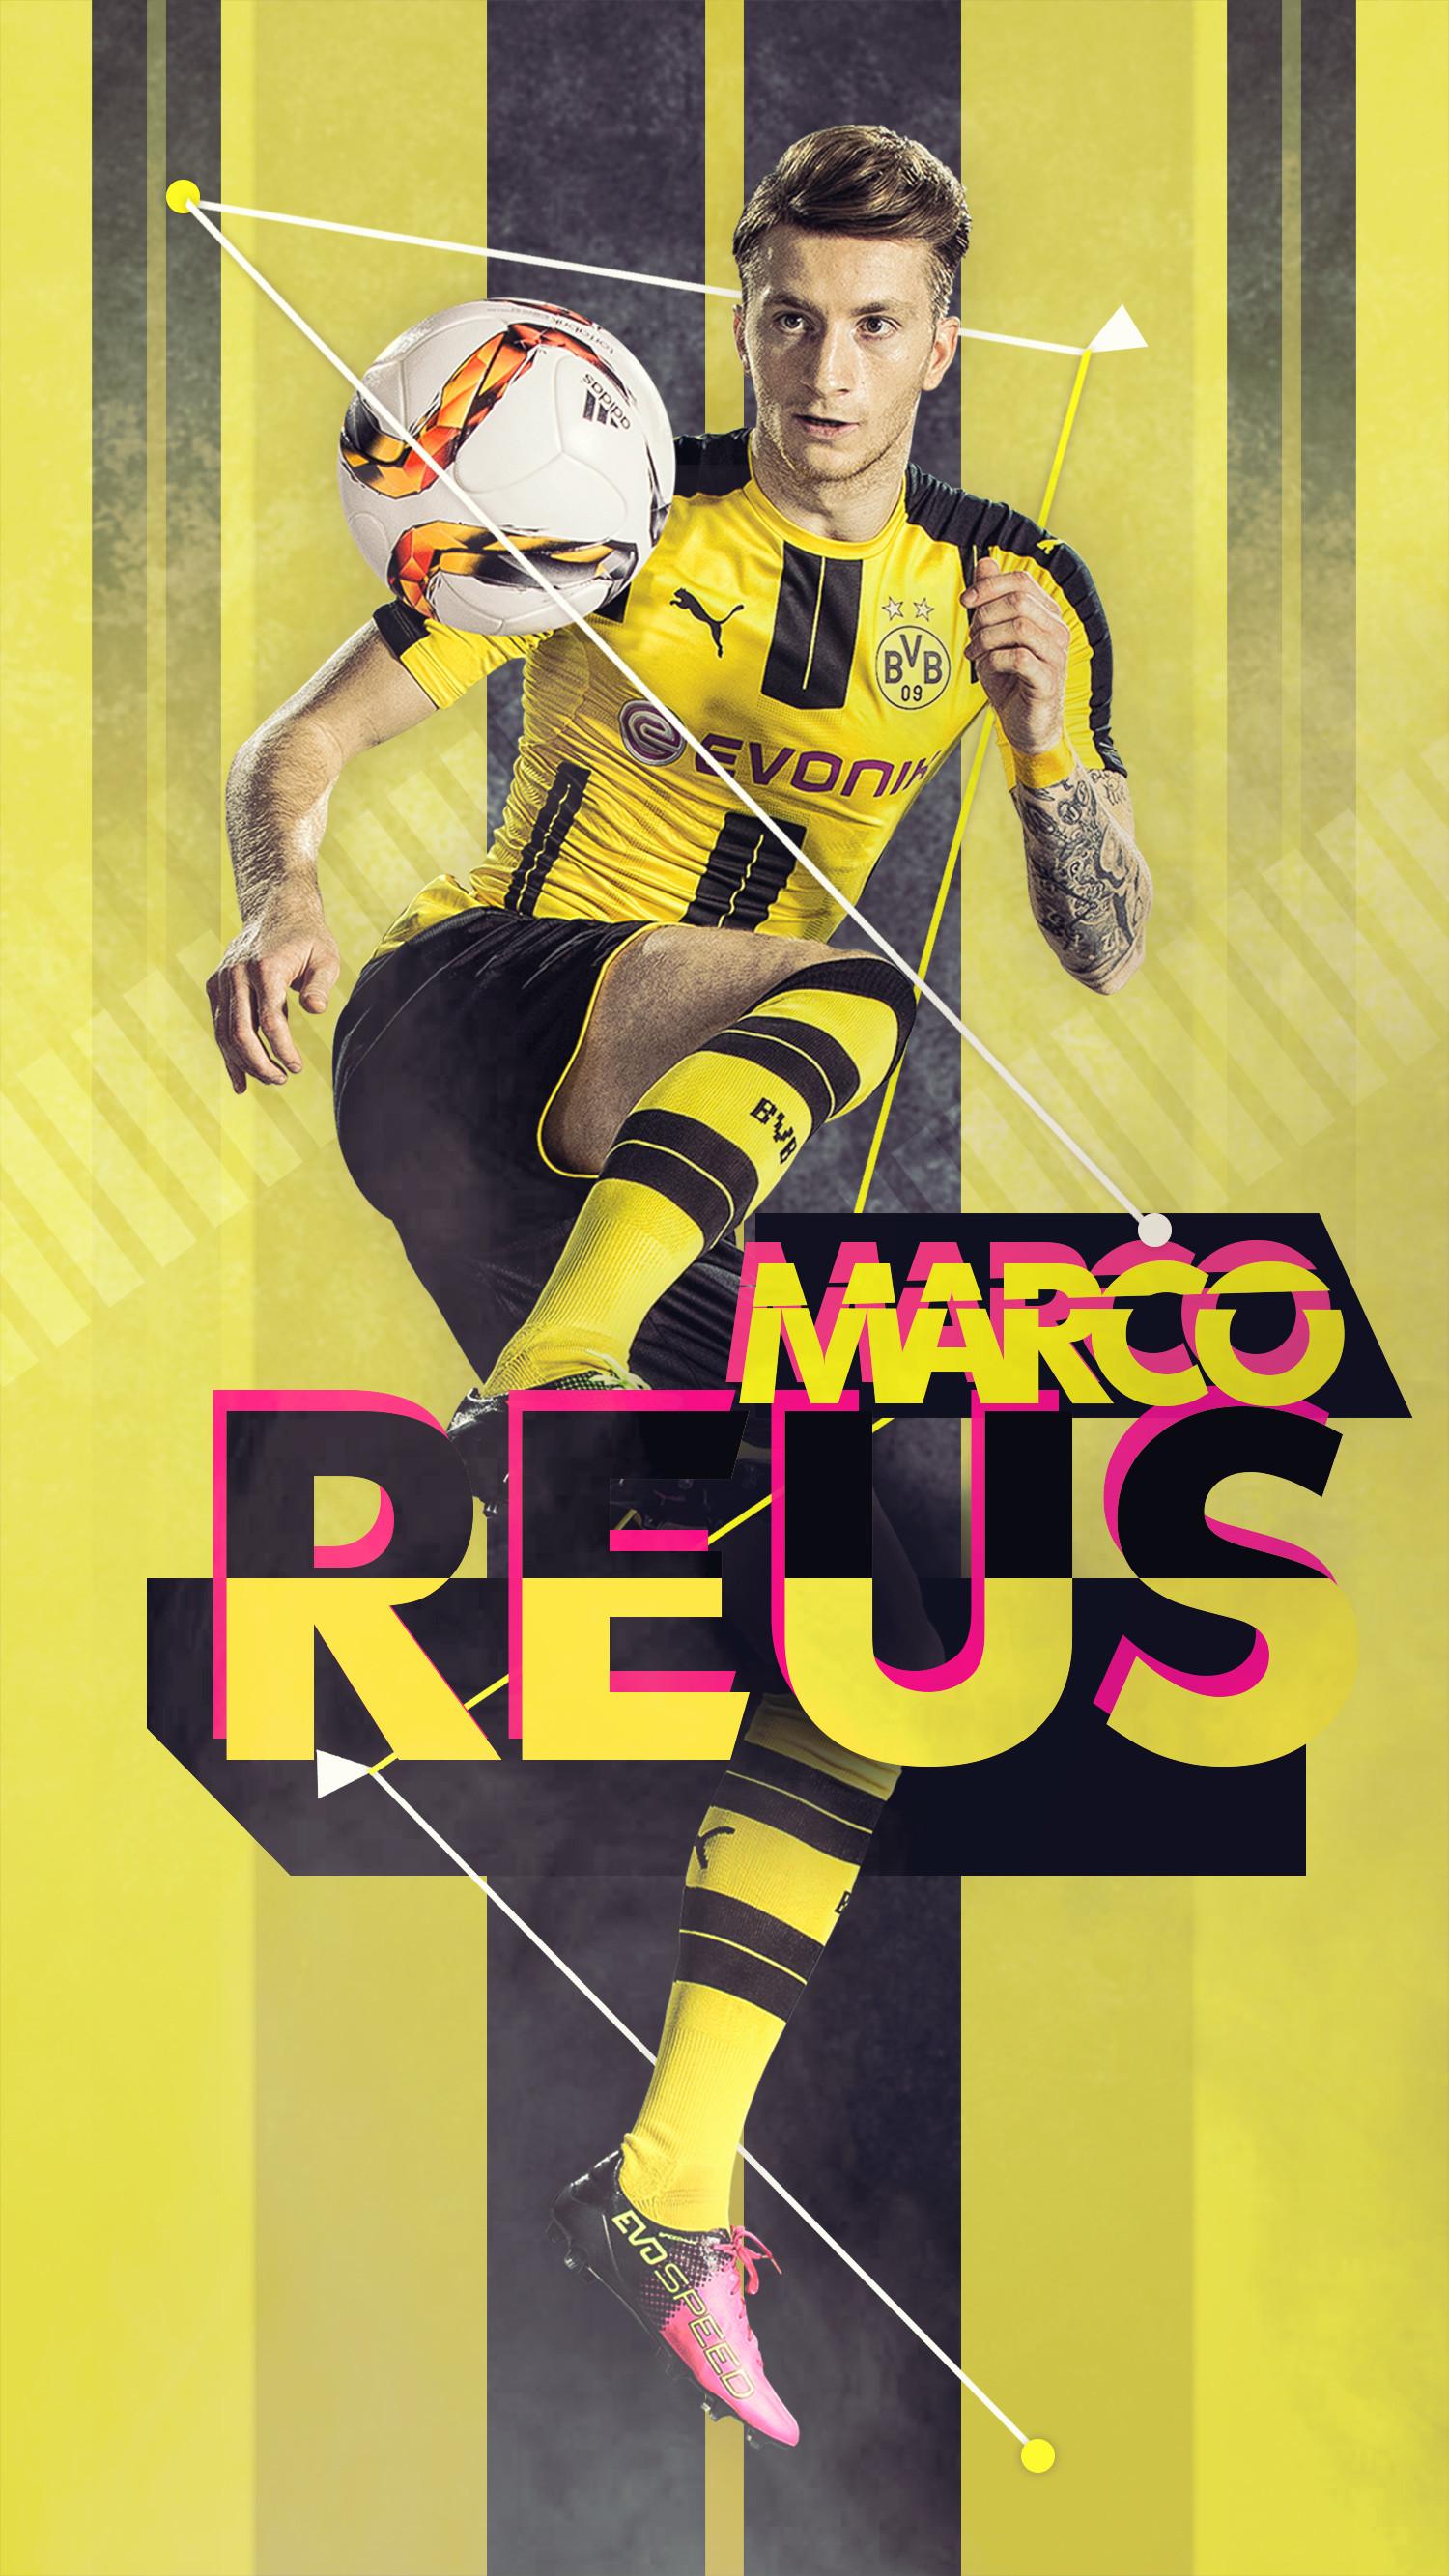 Marco Reus Wallpapers (75+ images)